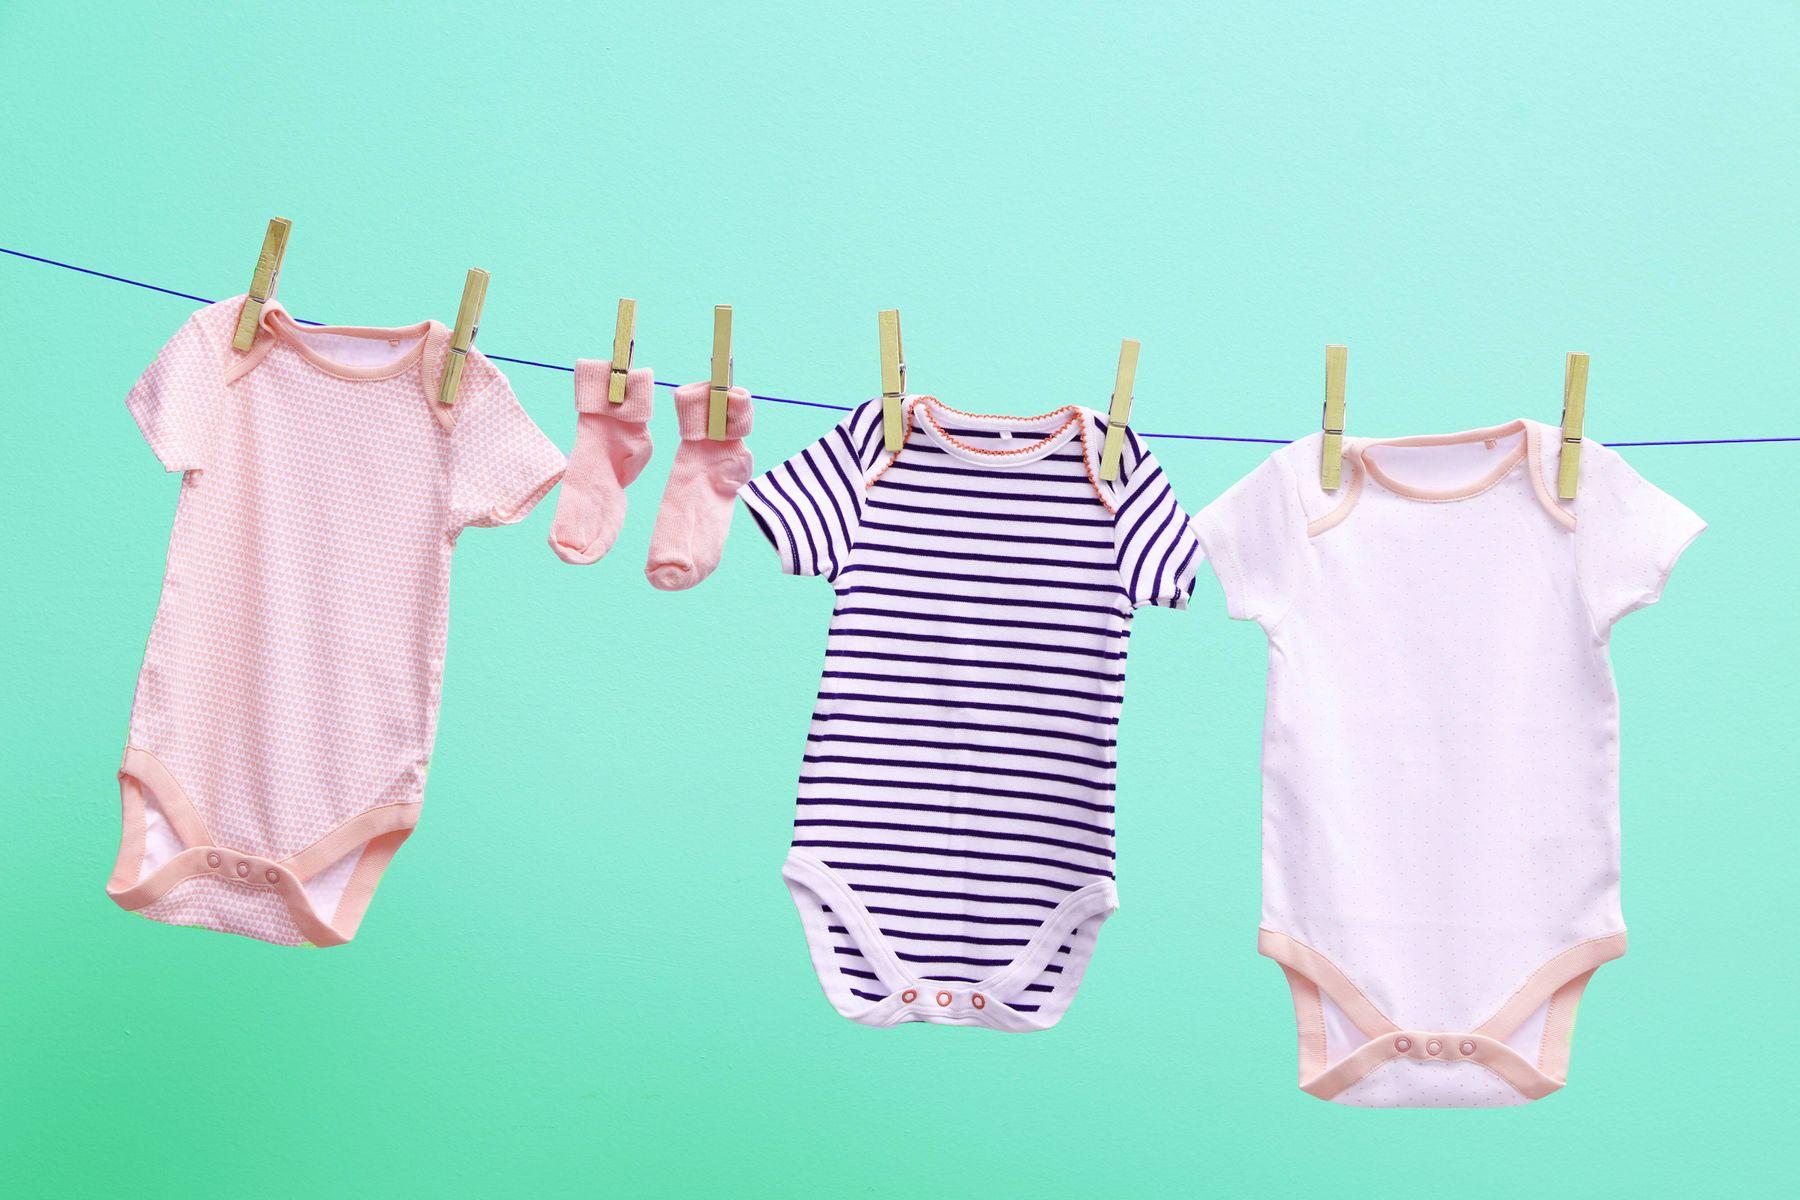 giặt quần áo em bé